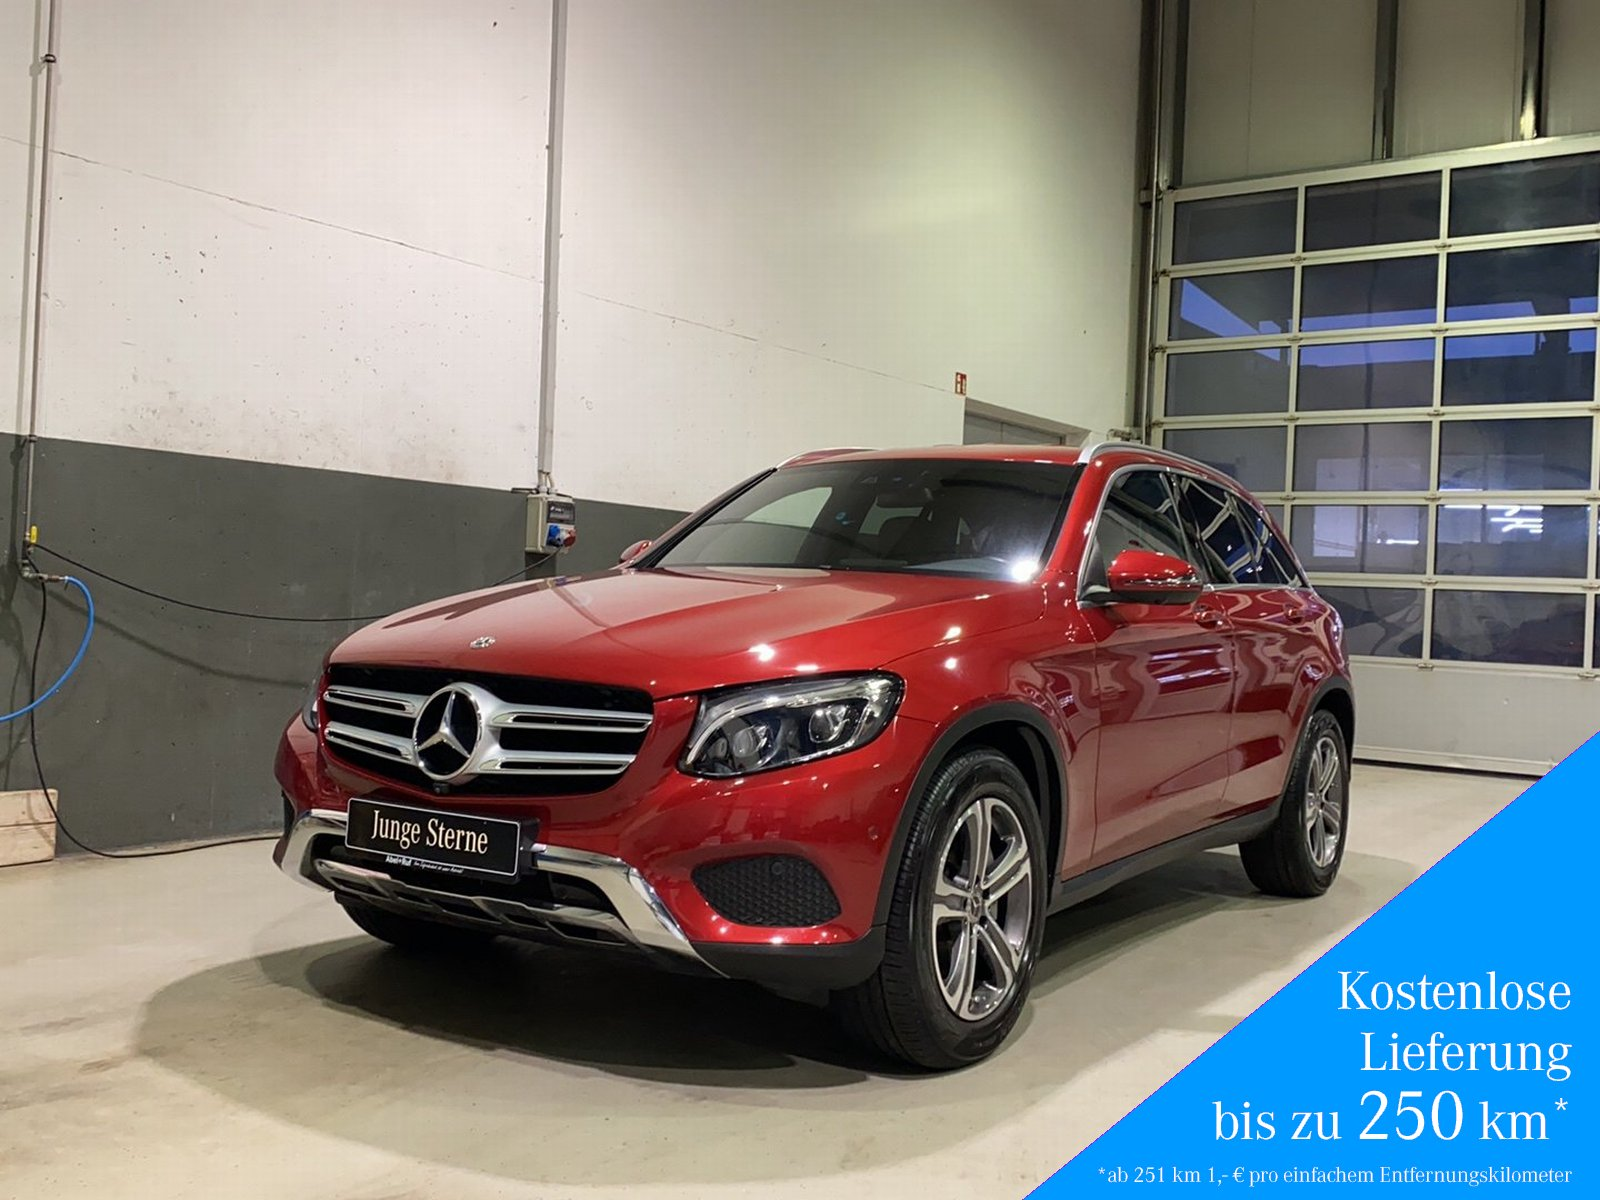 Mercedes-Benz GLC 350d 4M AMG+360°+COMAND+Kamera+AirBodyC.+LED, Jahr 2017, Diesel